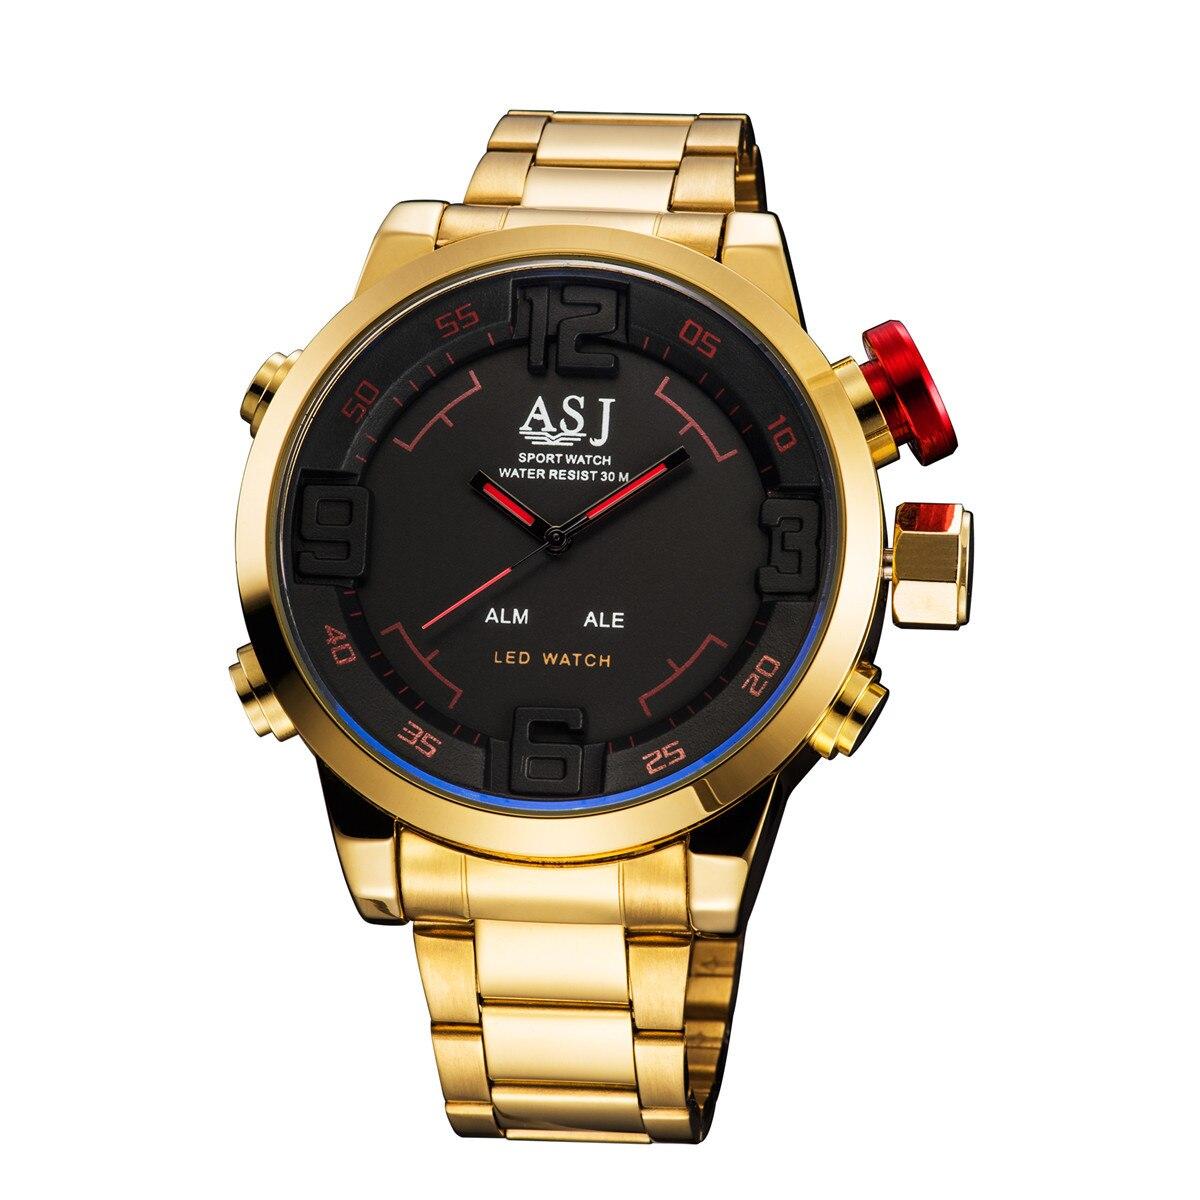 Asj Marken-männer Military Uhren Männer Luxury Gold Stahlband Quarzuhr Led-anzeige Sport Armbanduhren 50 Mt Wasserdicht